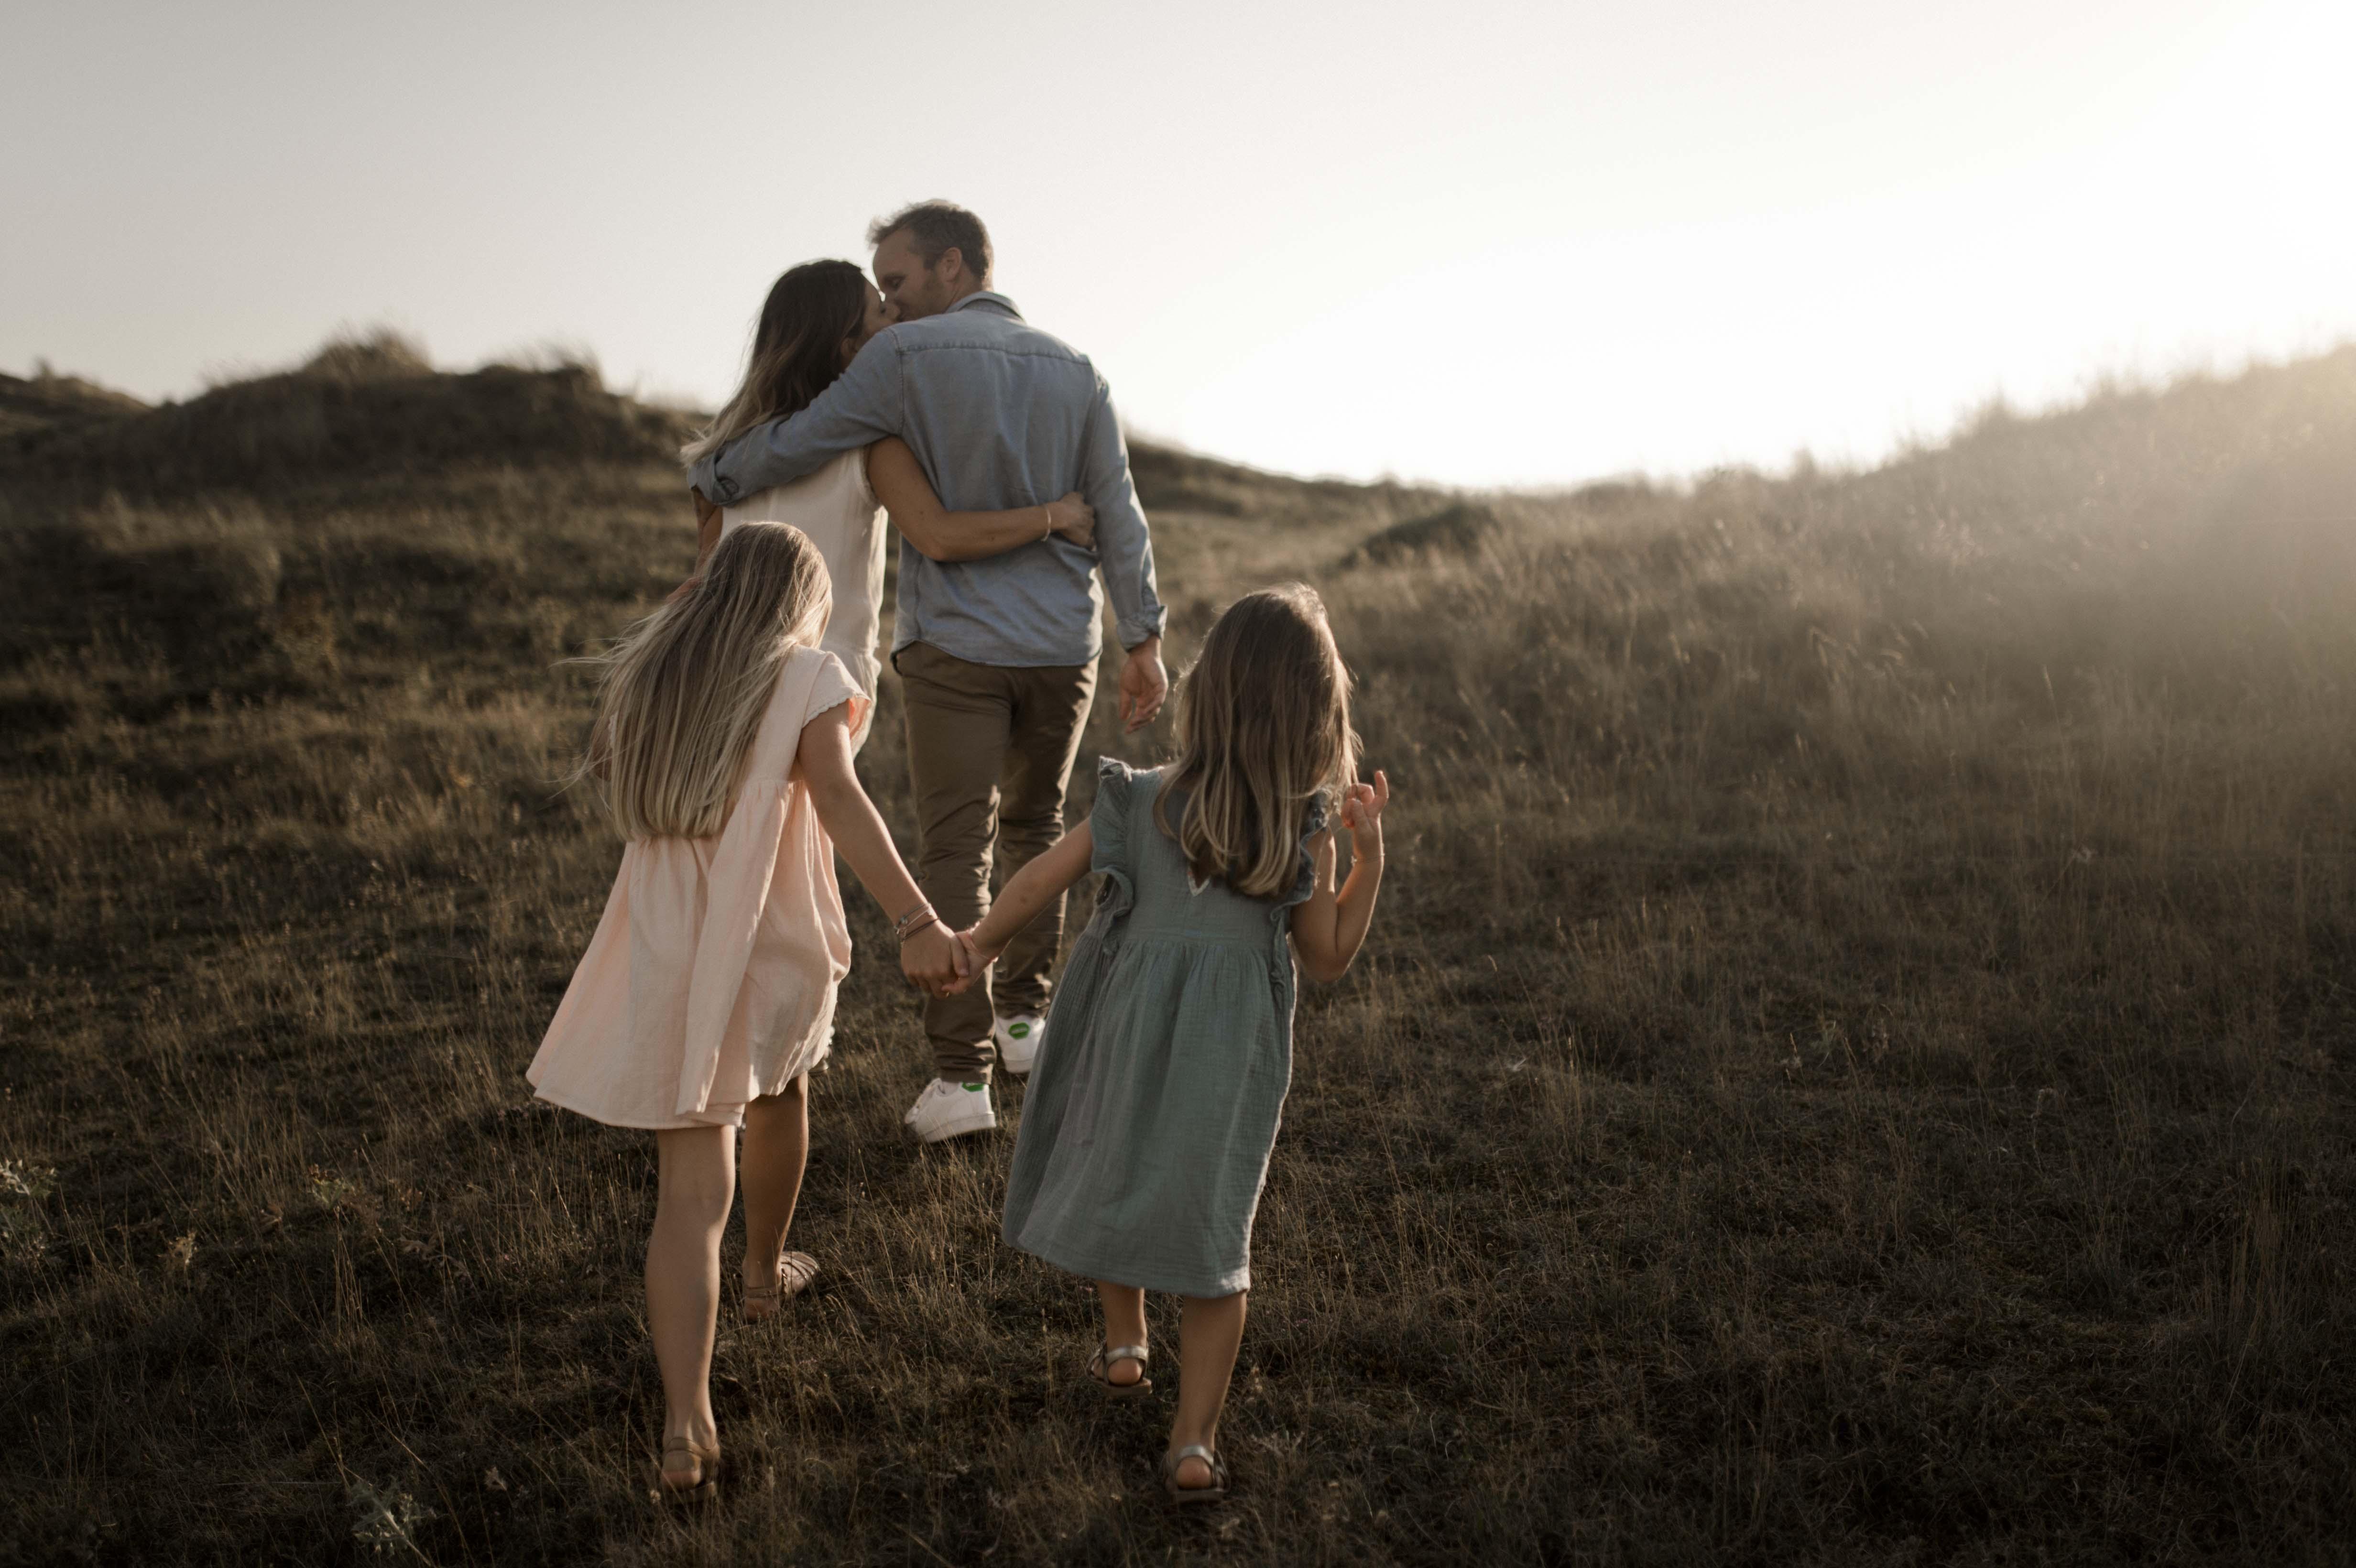 chocolat-chaud-lifestyle-photographes-SolveigRonan Famille 1